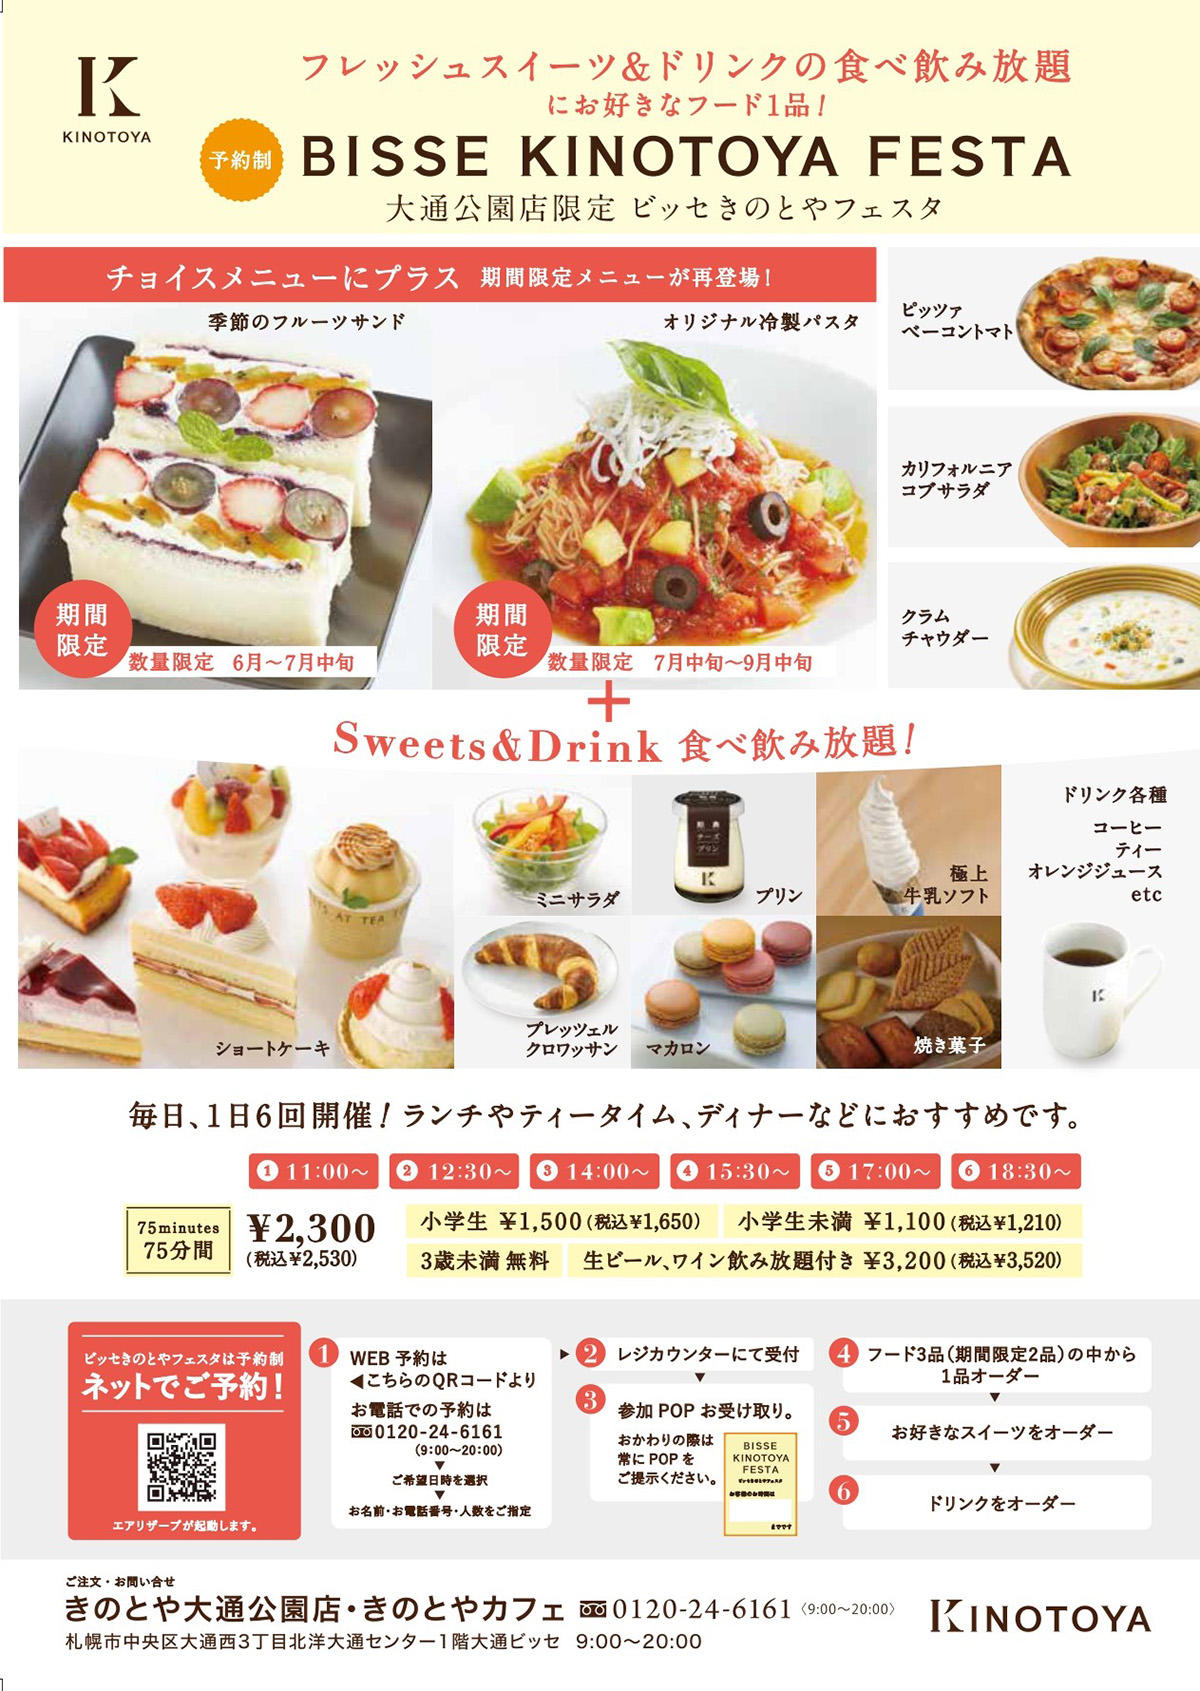 https://www.odori-bisse.com/info/kinotoyaf_200529_img2.jpg